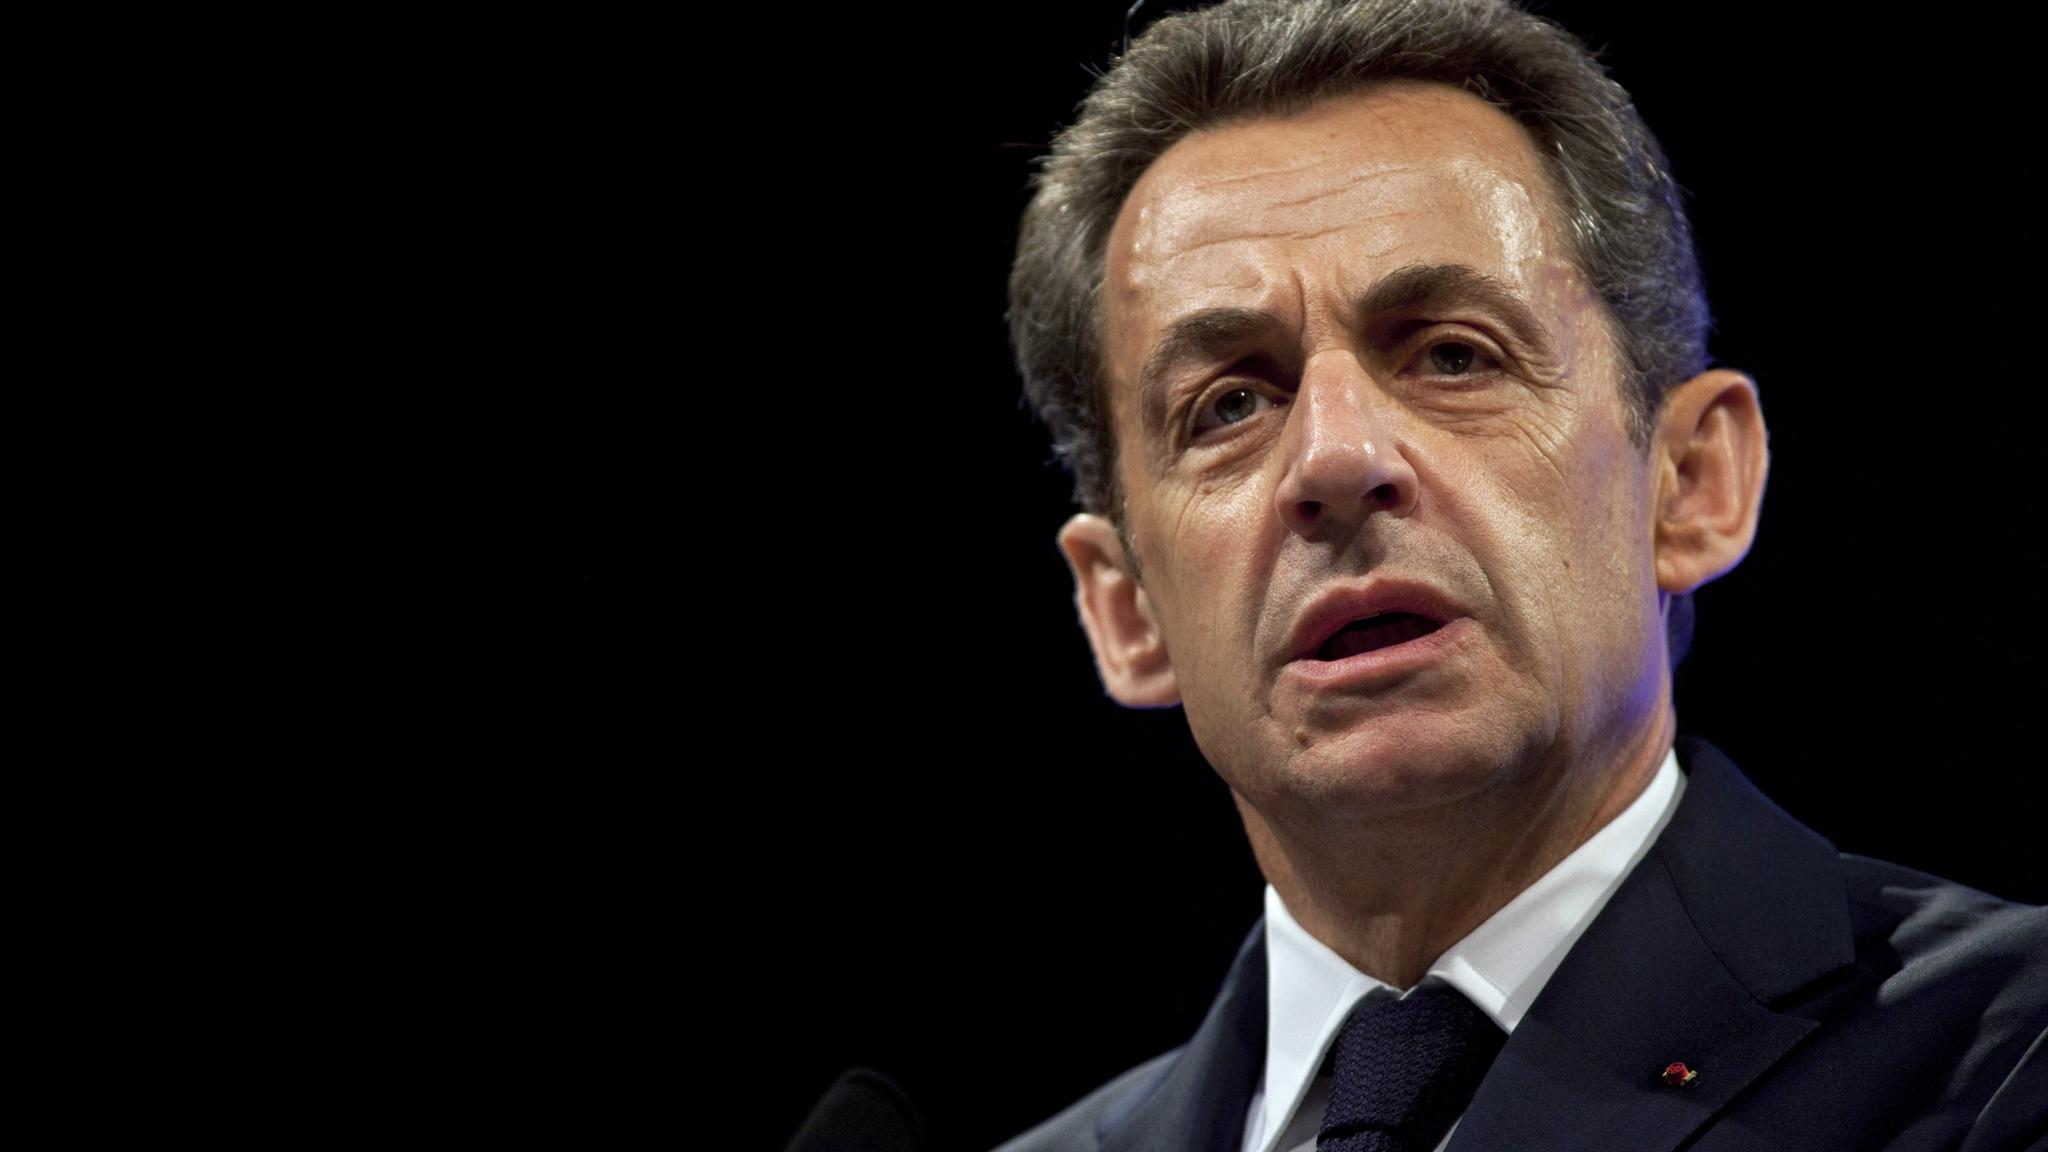 Nicolas Sarkozy Picks Tough Path For Comeback Financial Times